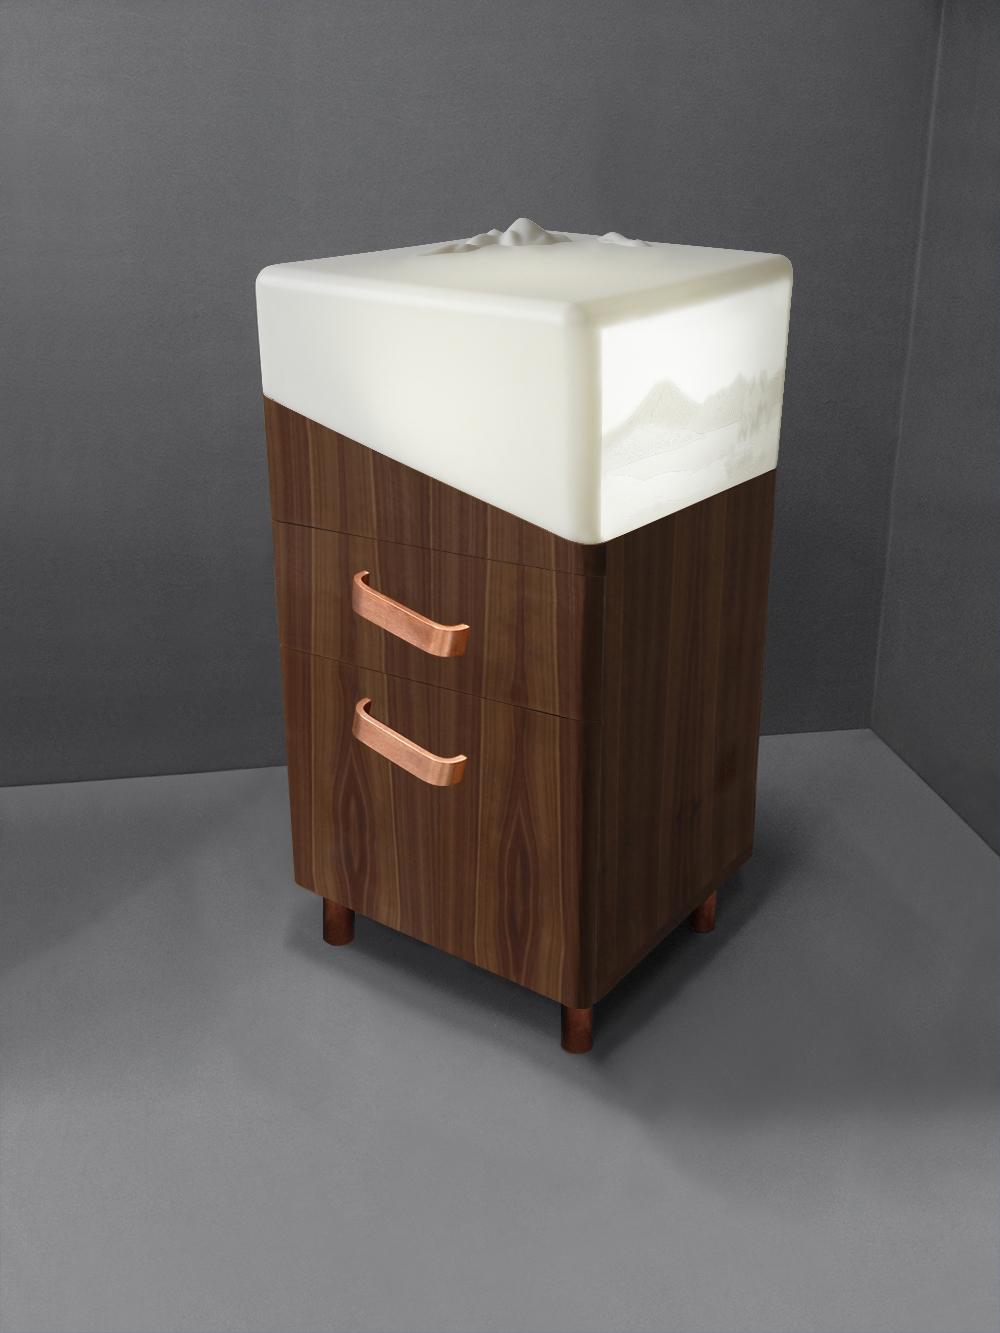 WALNUT Jardin d'Hiver bedside cabinet drawers 3-4- Copyright 2015 Géraldine Biard.jpg